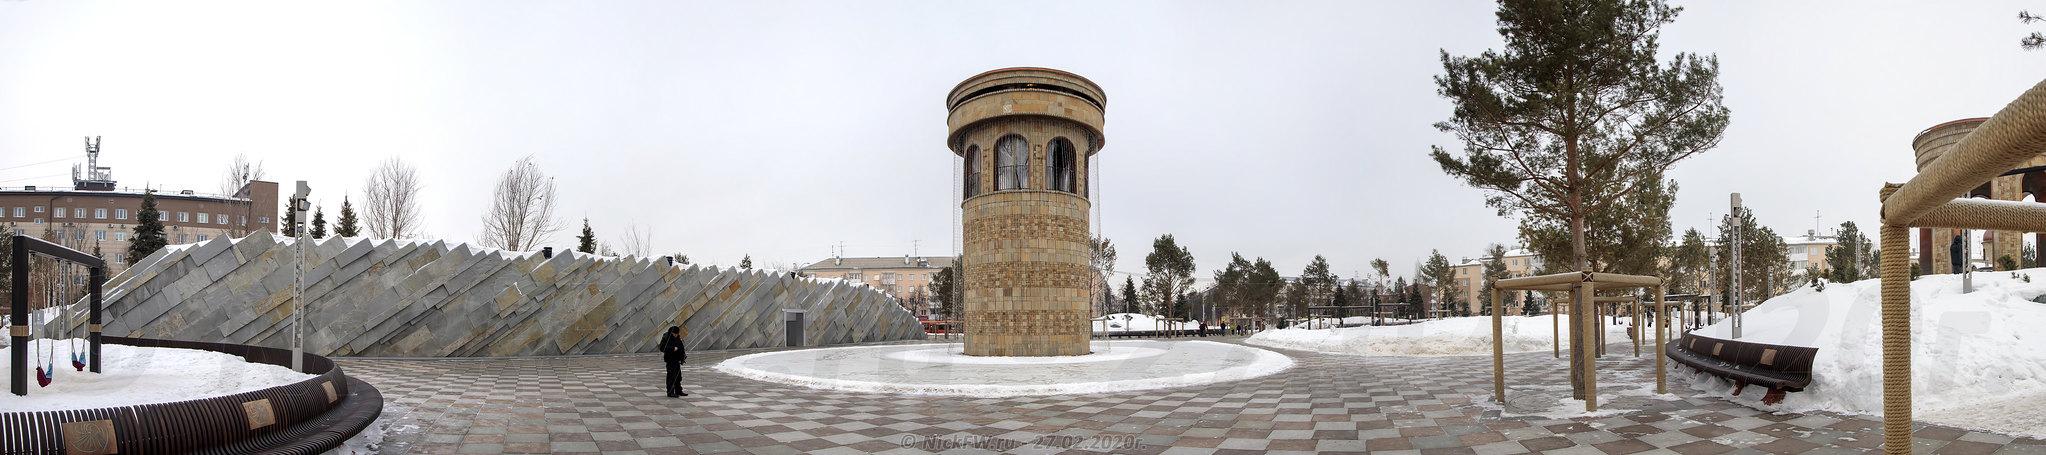 10. Парк Ангелов - панорама © NickFW.ru - 27.02.2020г.